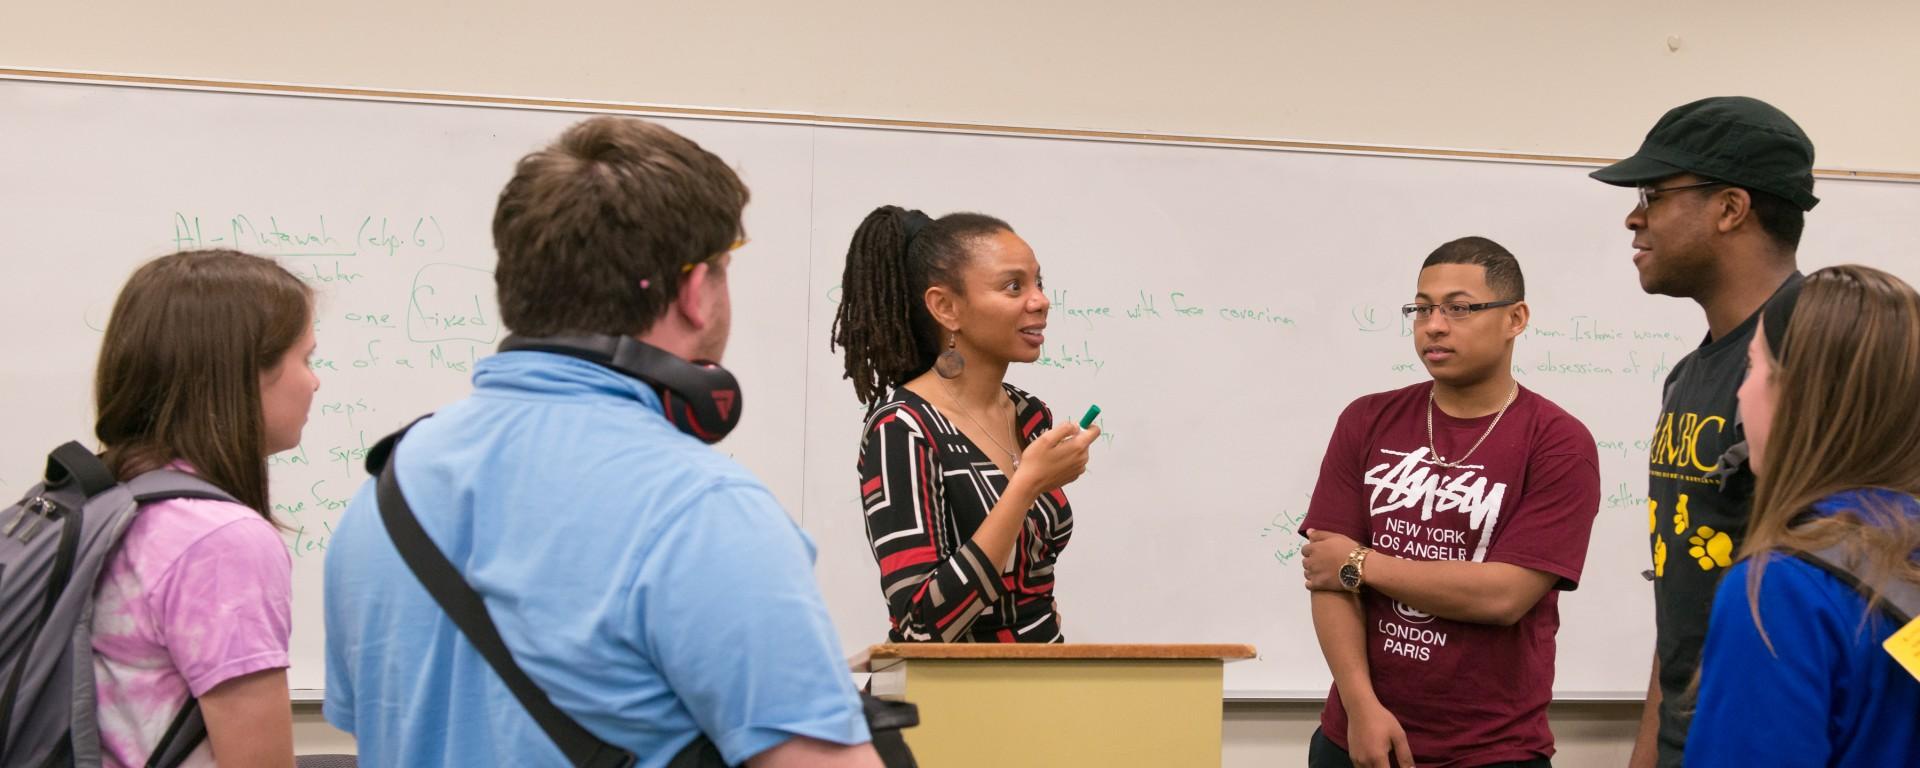 Kimberly Moffitt teaching